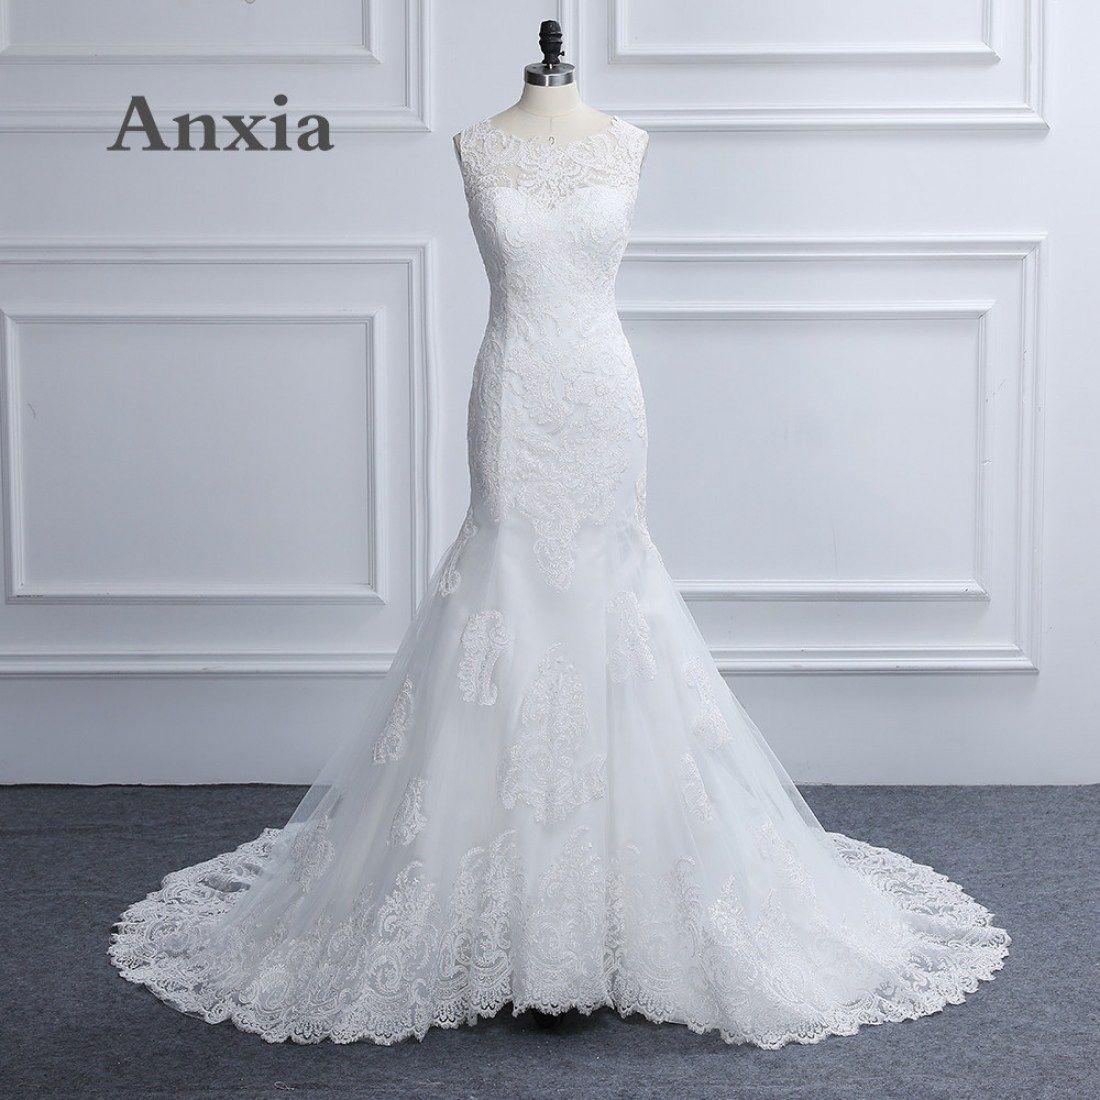 30 Beautiful Snow White Wedding Dresses | Snow white wedding dress ...